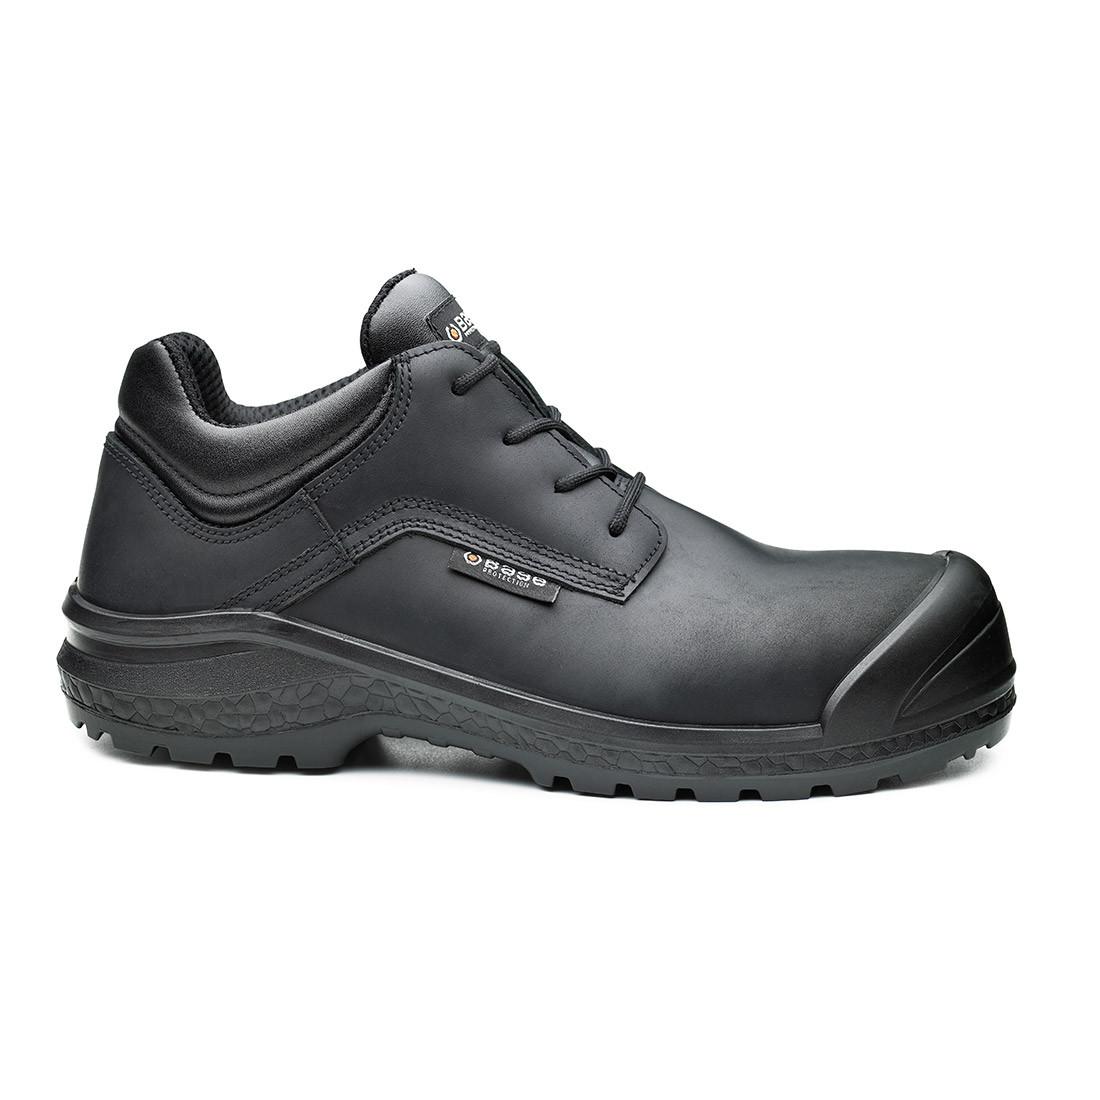 Pantofi Be-Browny S3 CI SRC - Incaltaminte de protectie